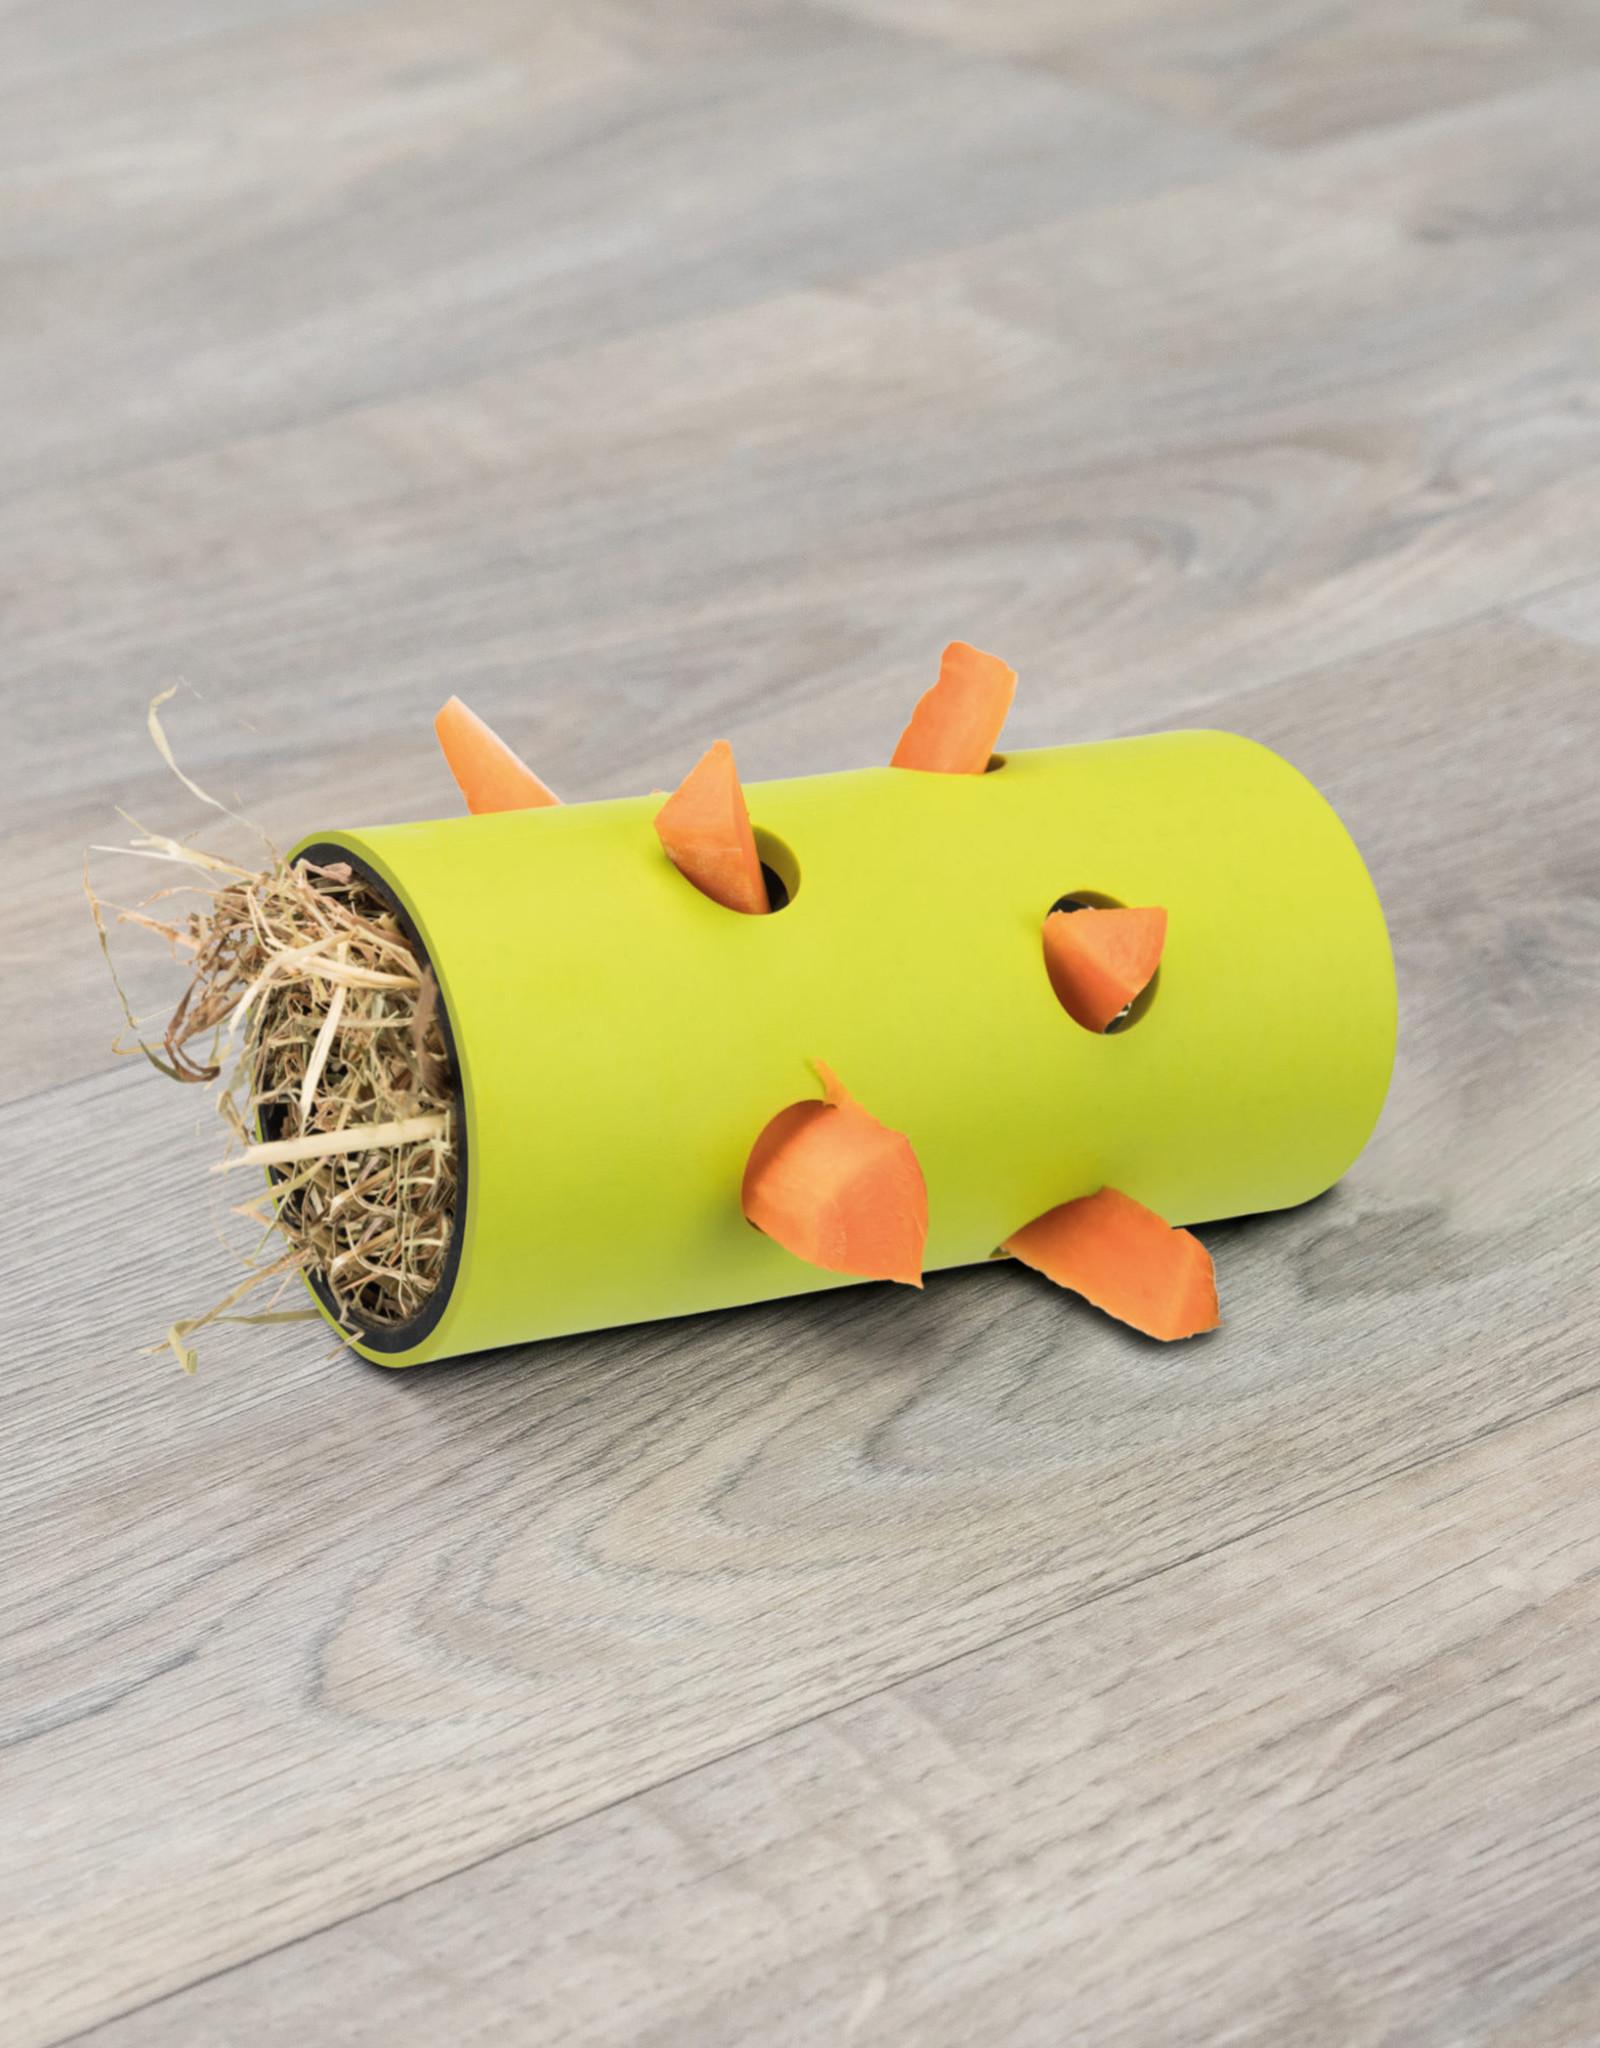 Trixie Snack Roll Small Animal Forage Toy, plastic 5.5 x 12cm